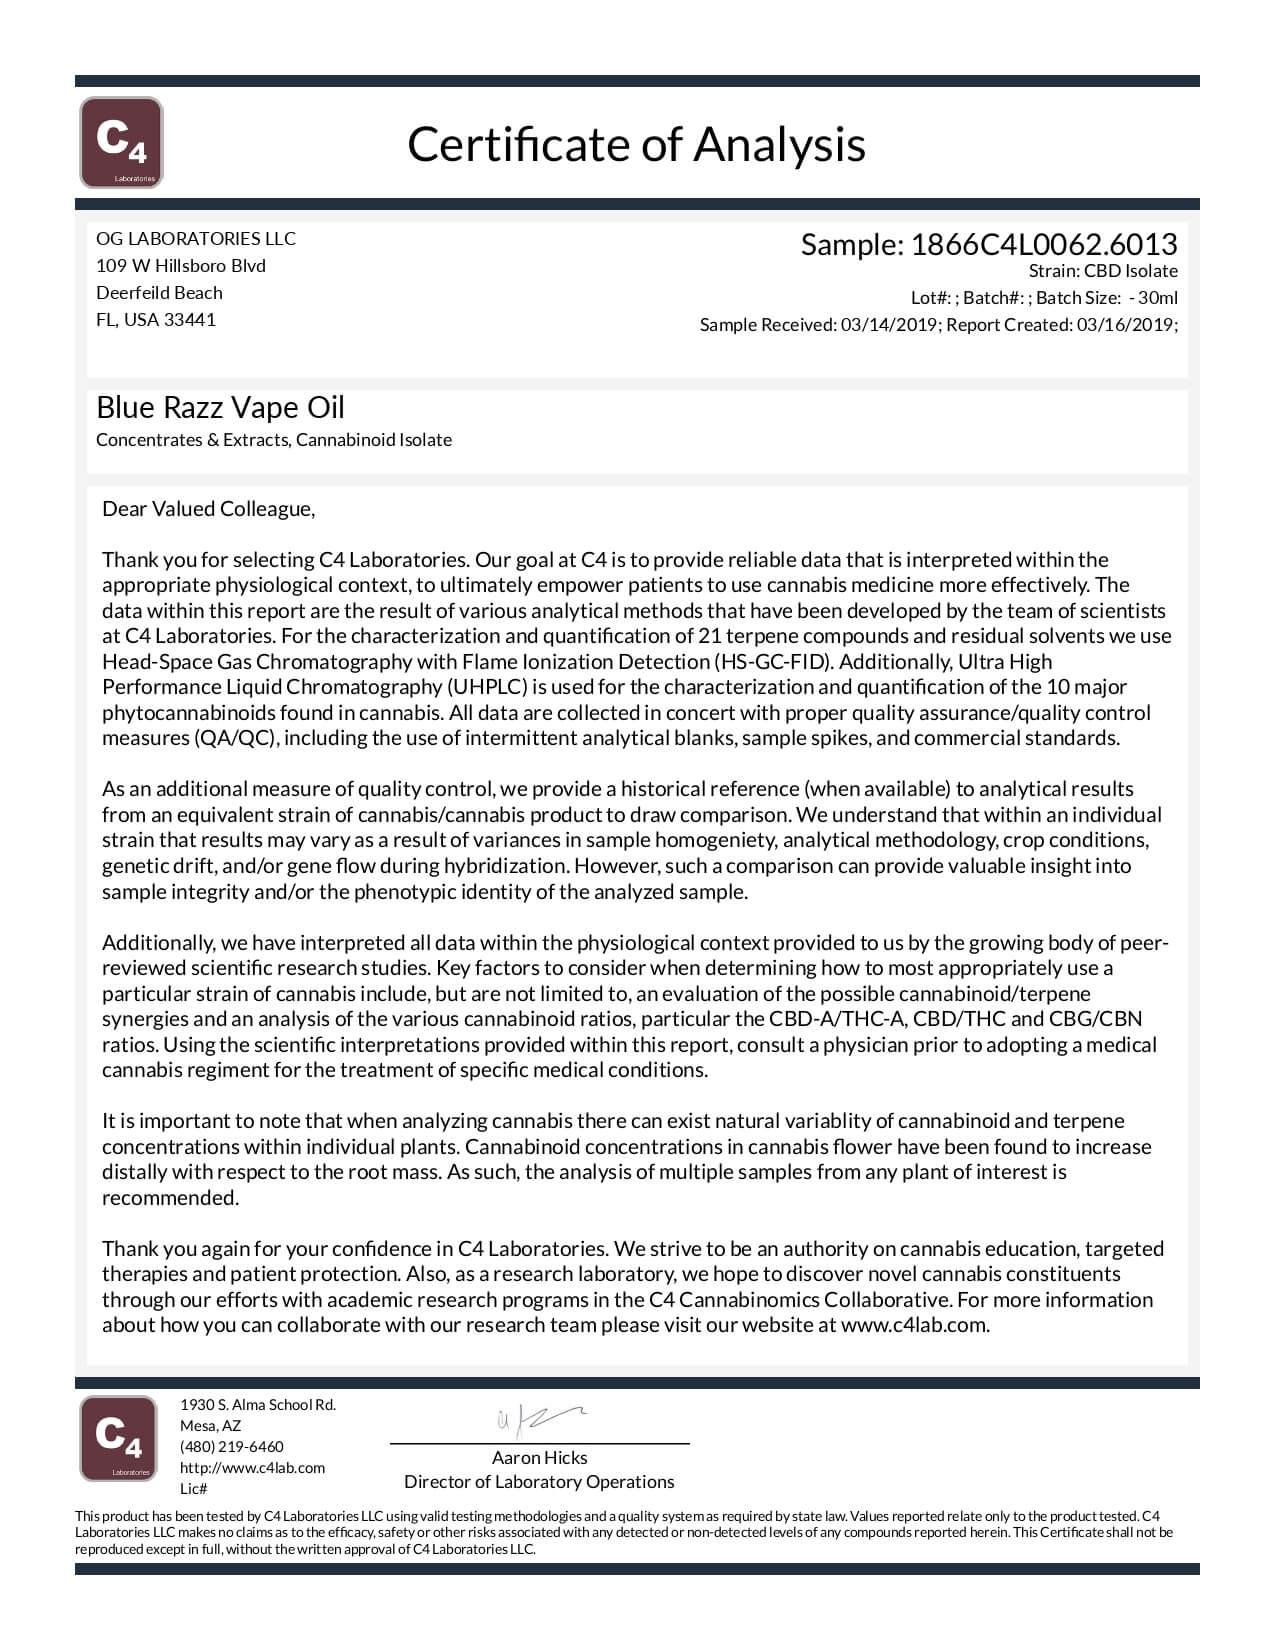 OG Labs CBD Vape Juice Blue Razz 300mg Lab Report